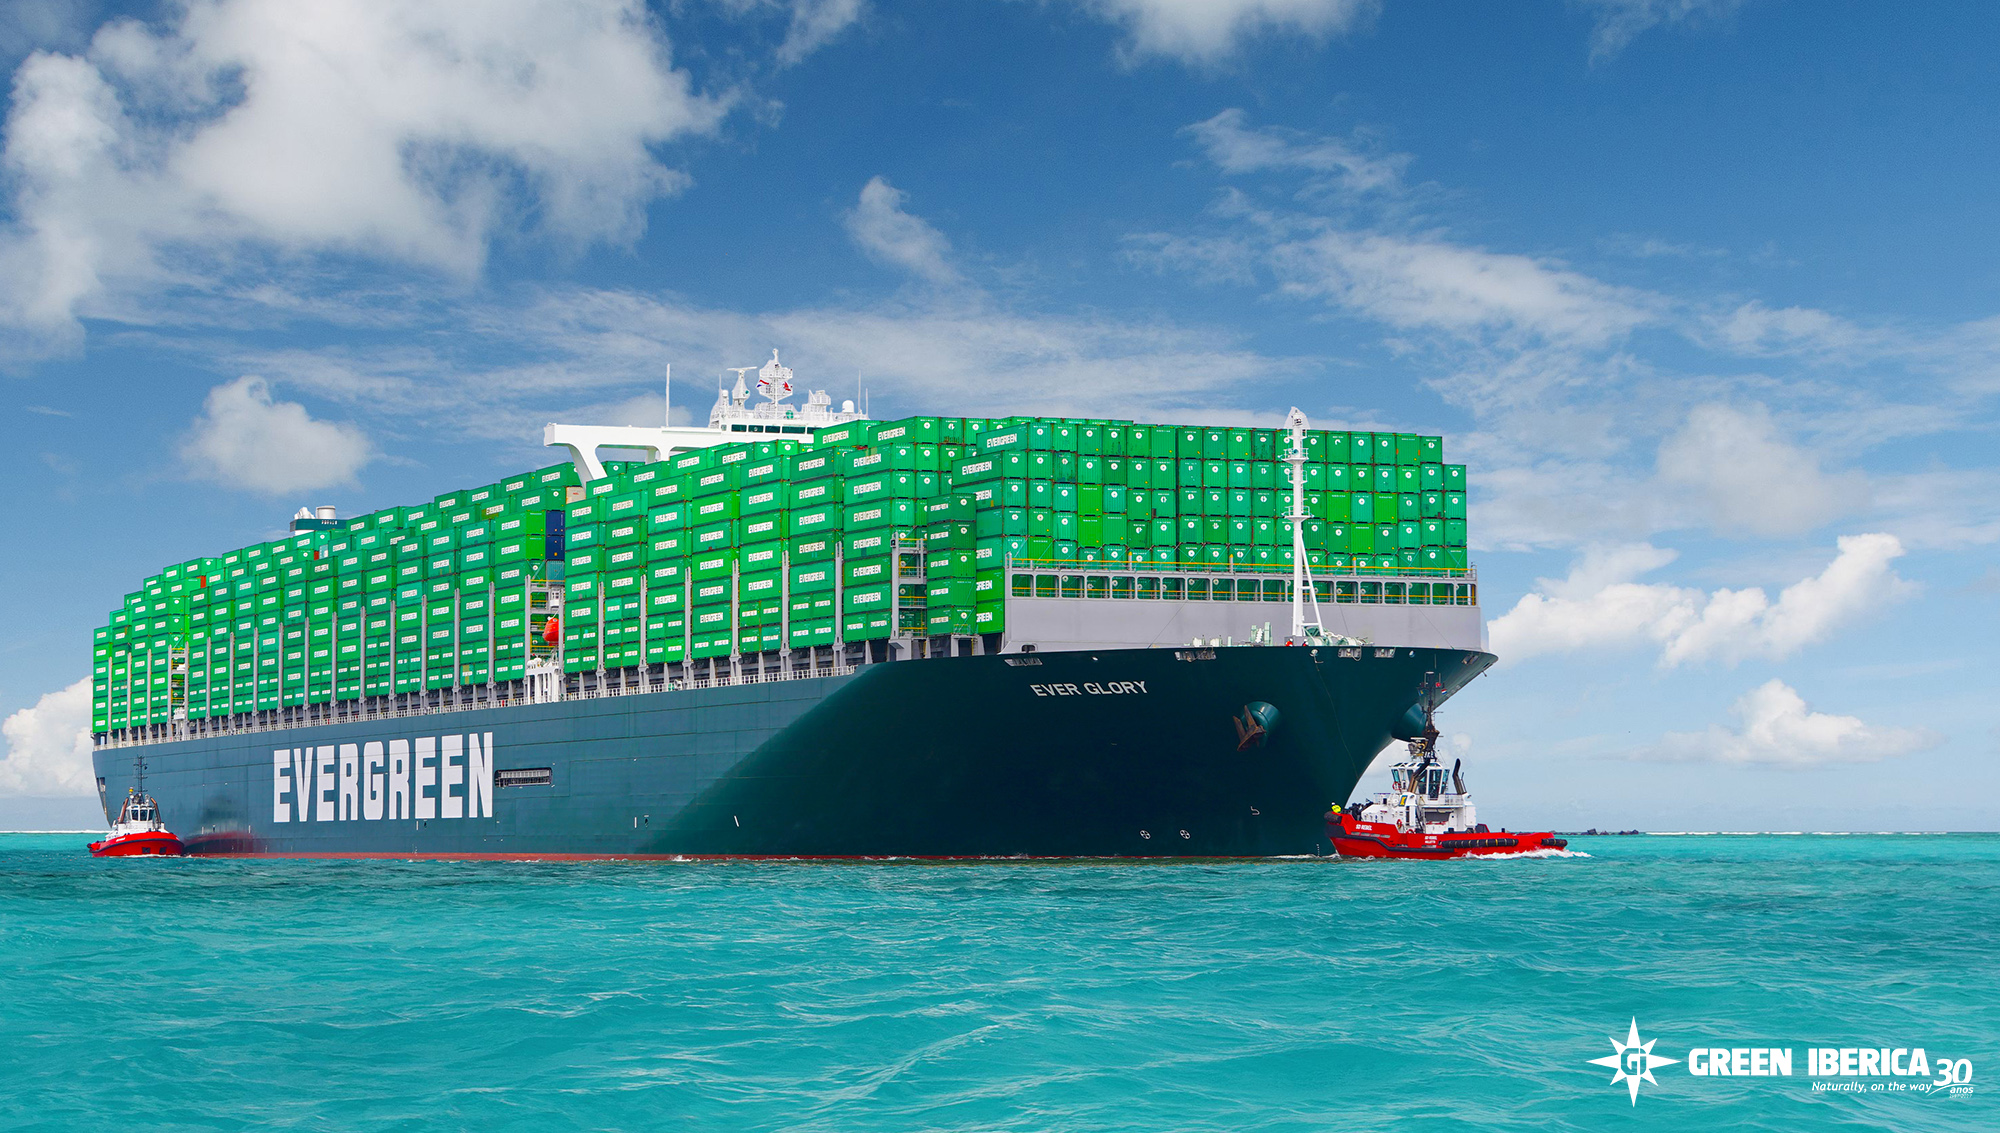 Ever Glory Ship, Evergreen, Green Ibérica